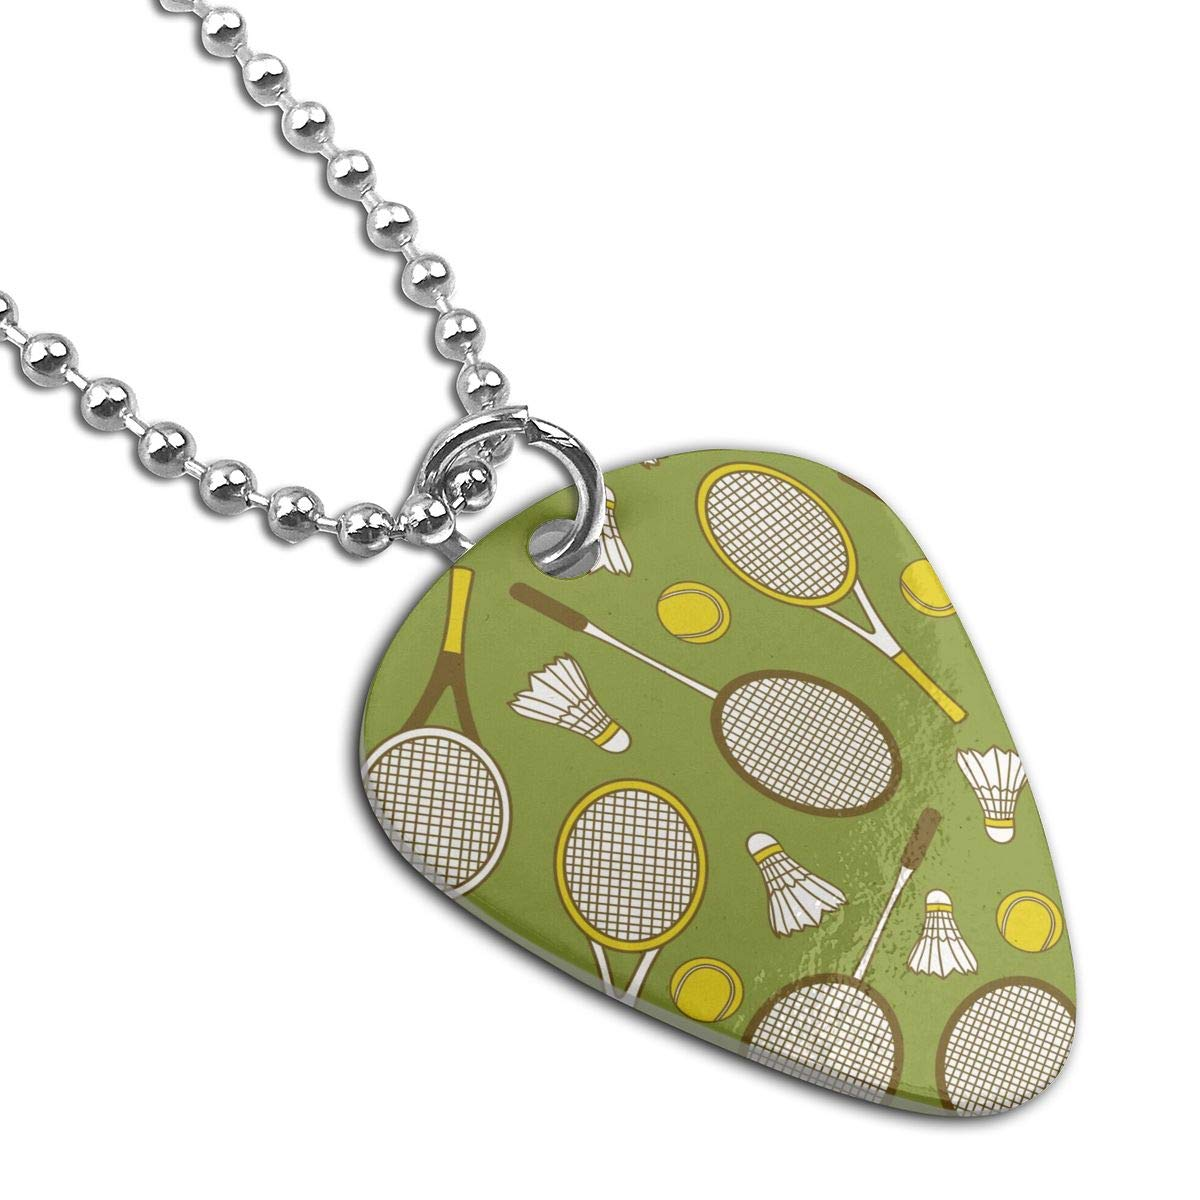 Tennis Badminton Custom Guitar Pick Pendant Necklace Keychain